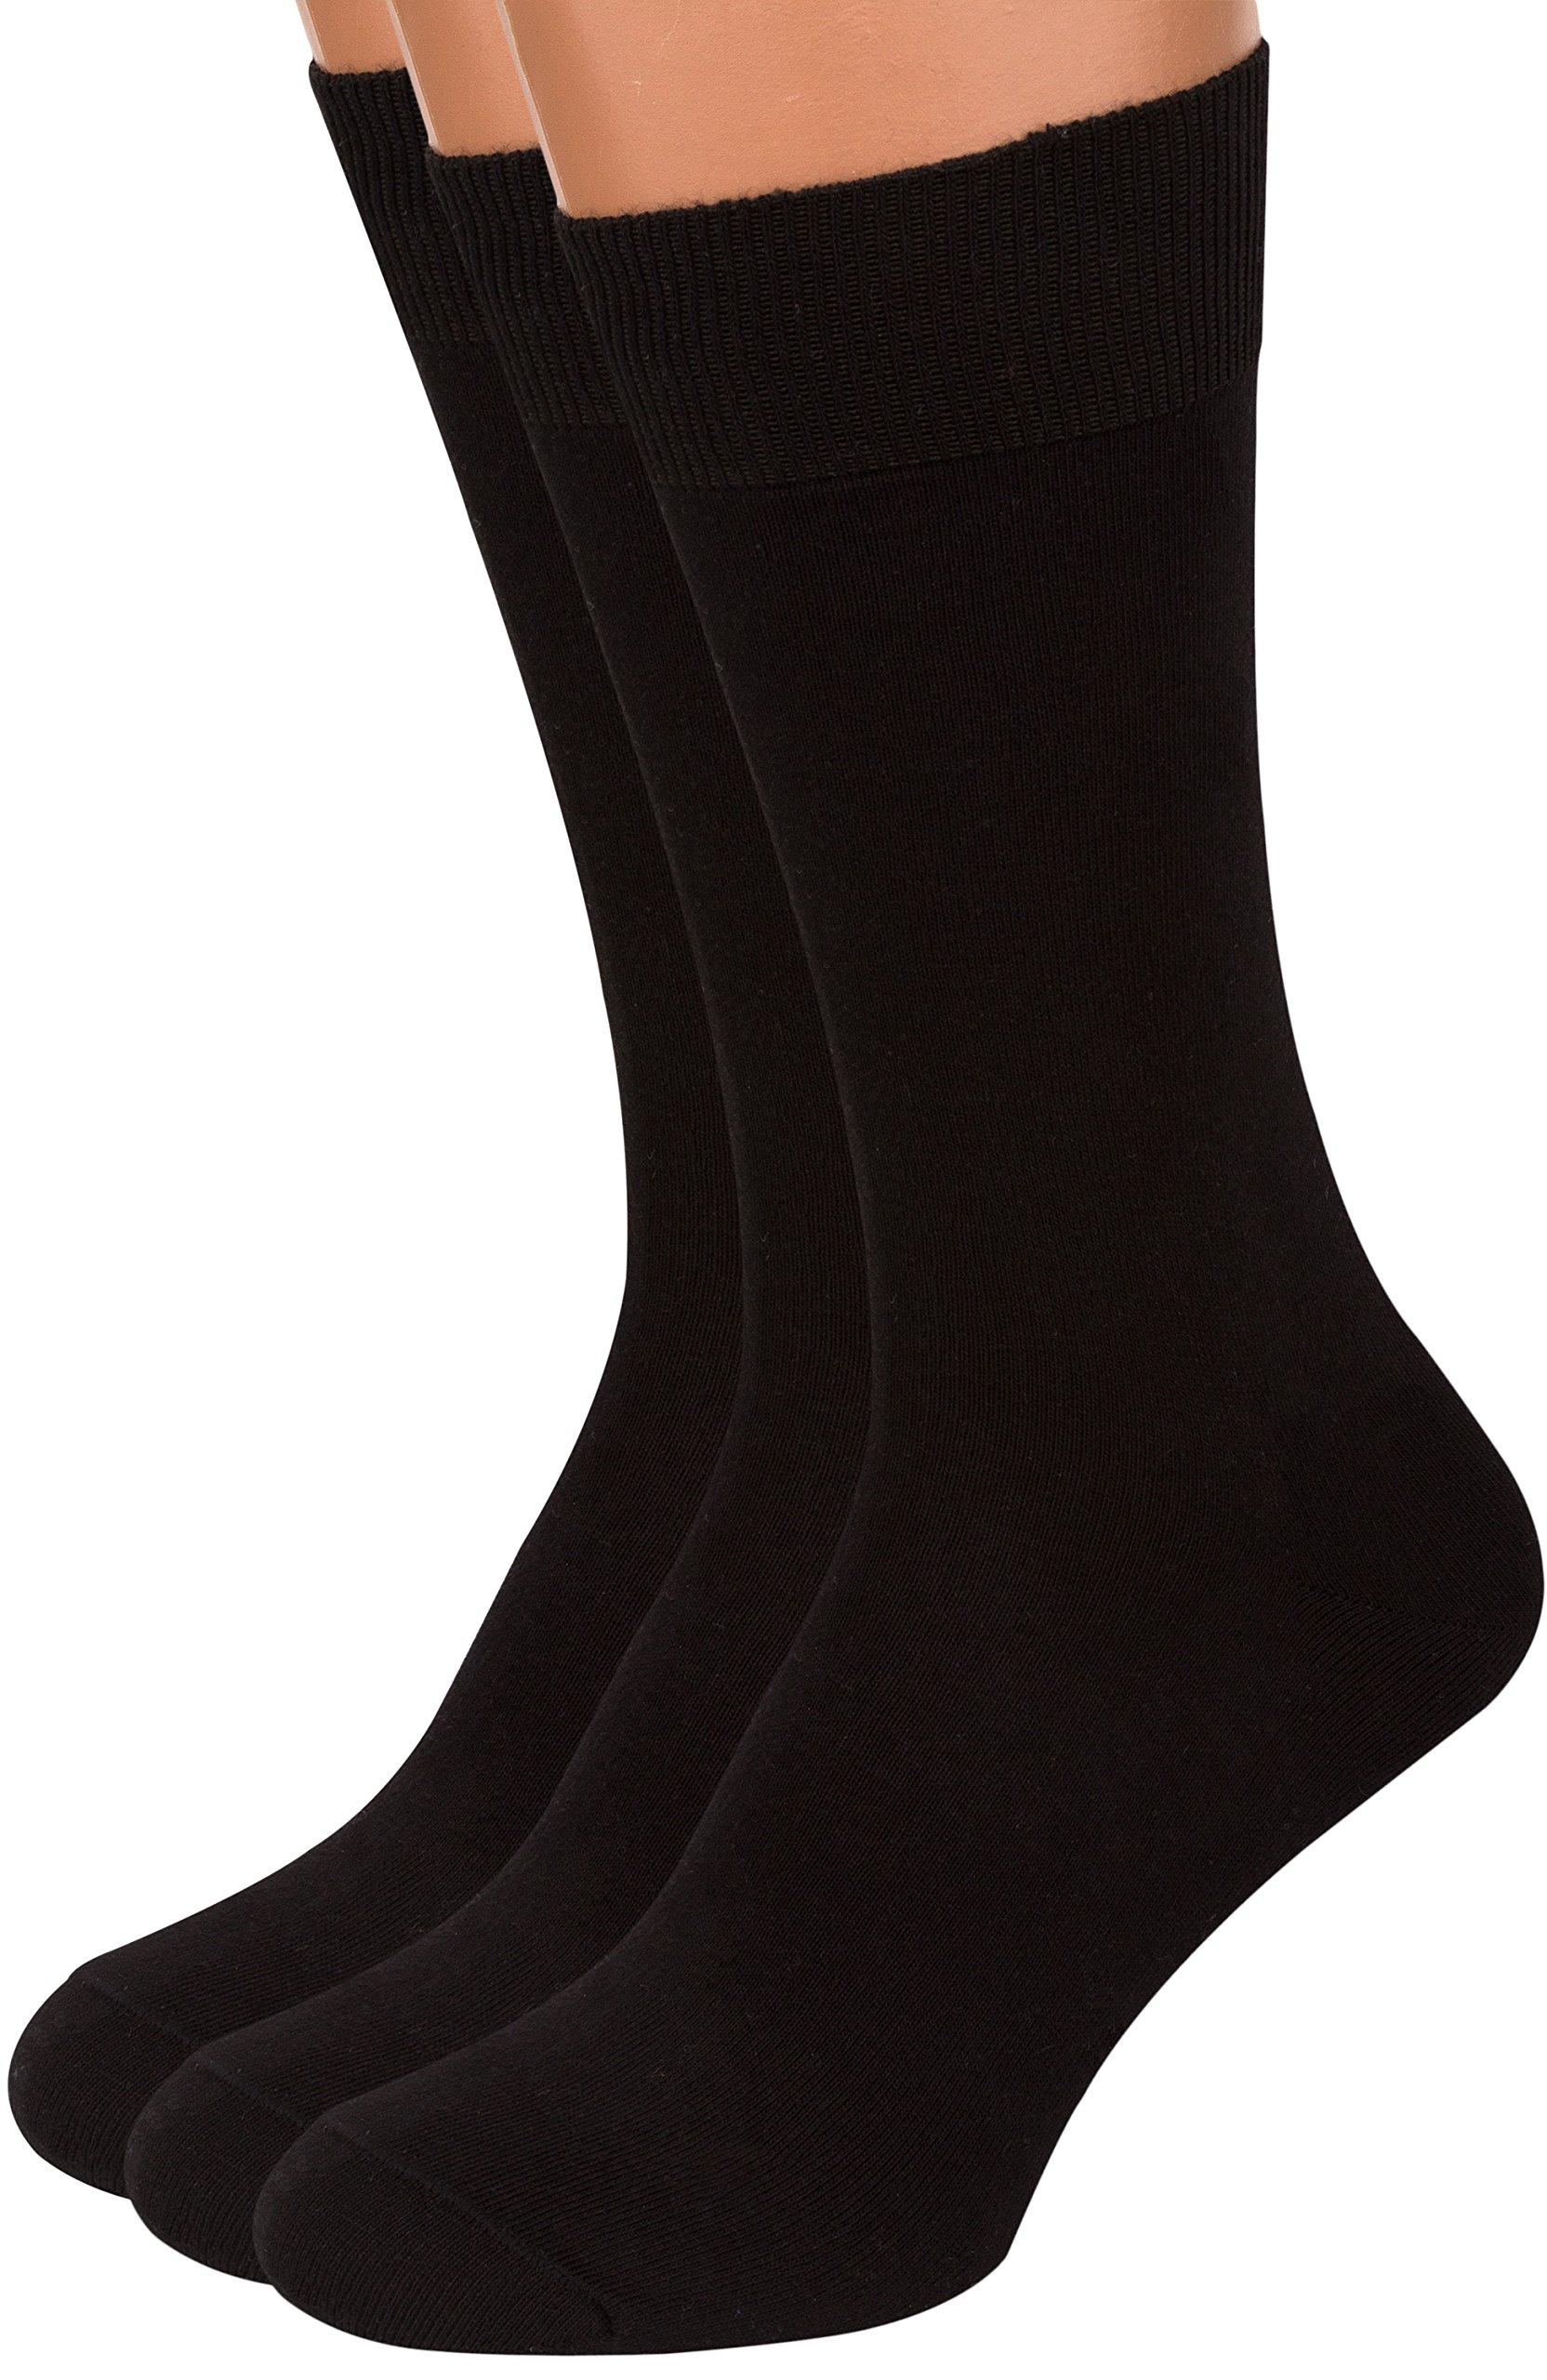 Premium Black Dress Socks Men, 3 packs Rich European Organic Cotton Crew AIR SOCKS (Black, L)